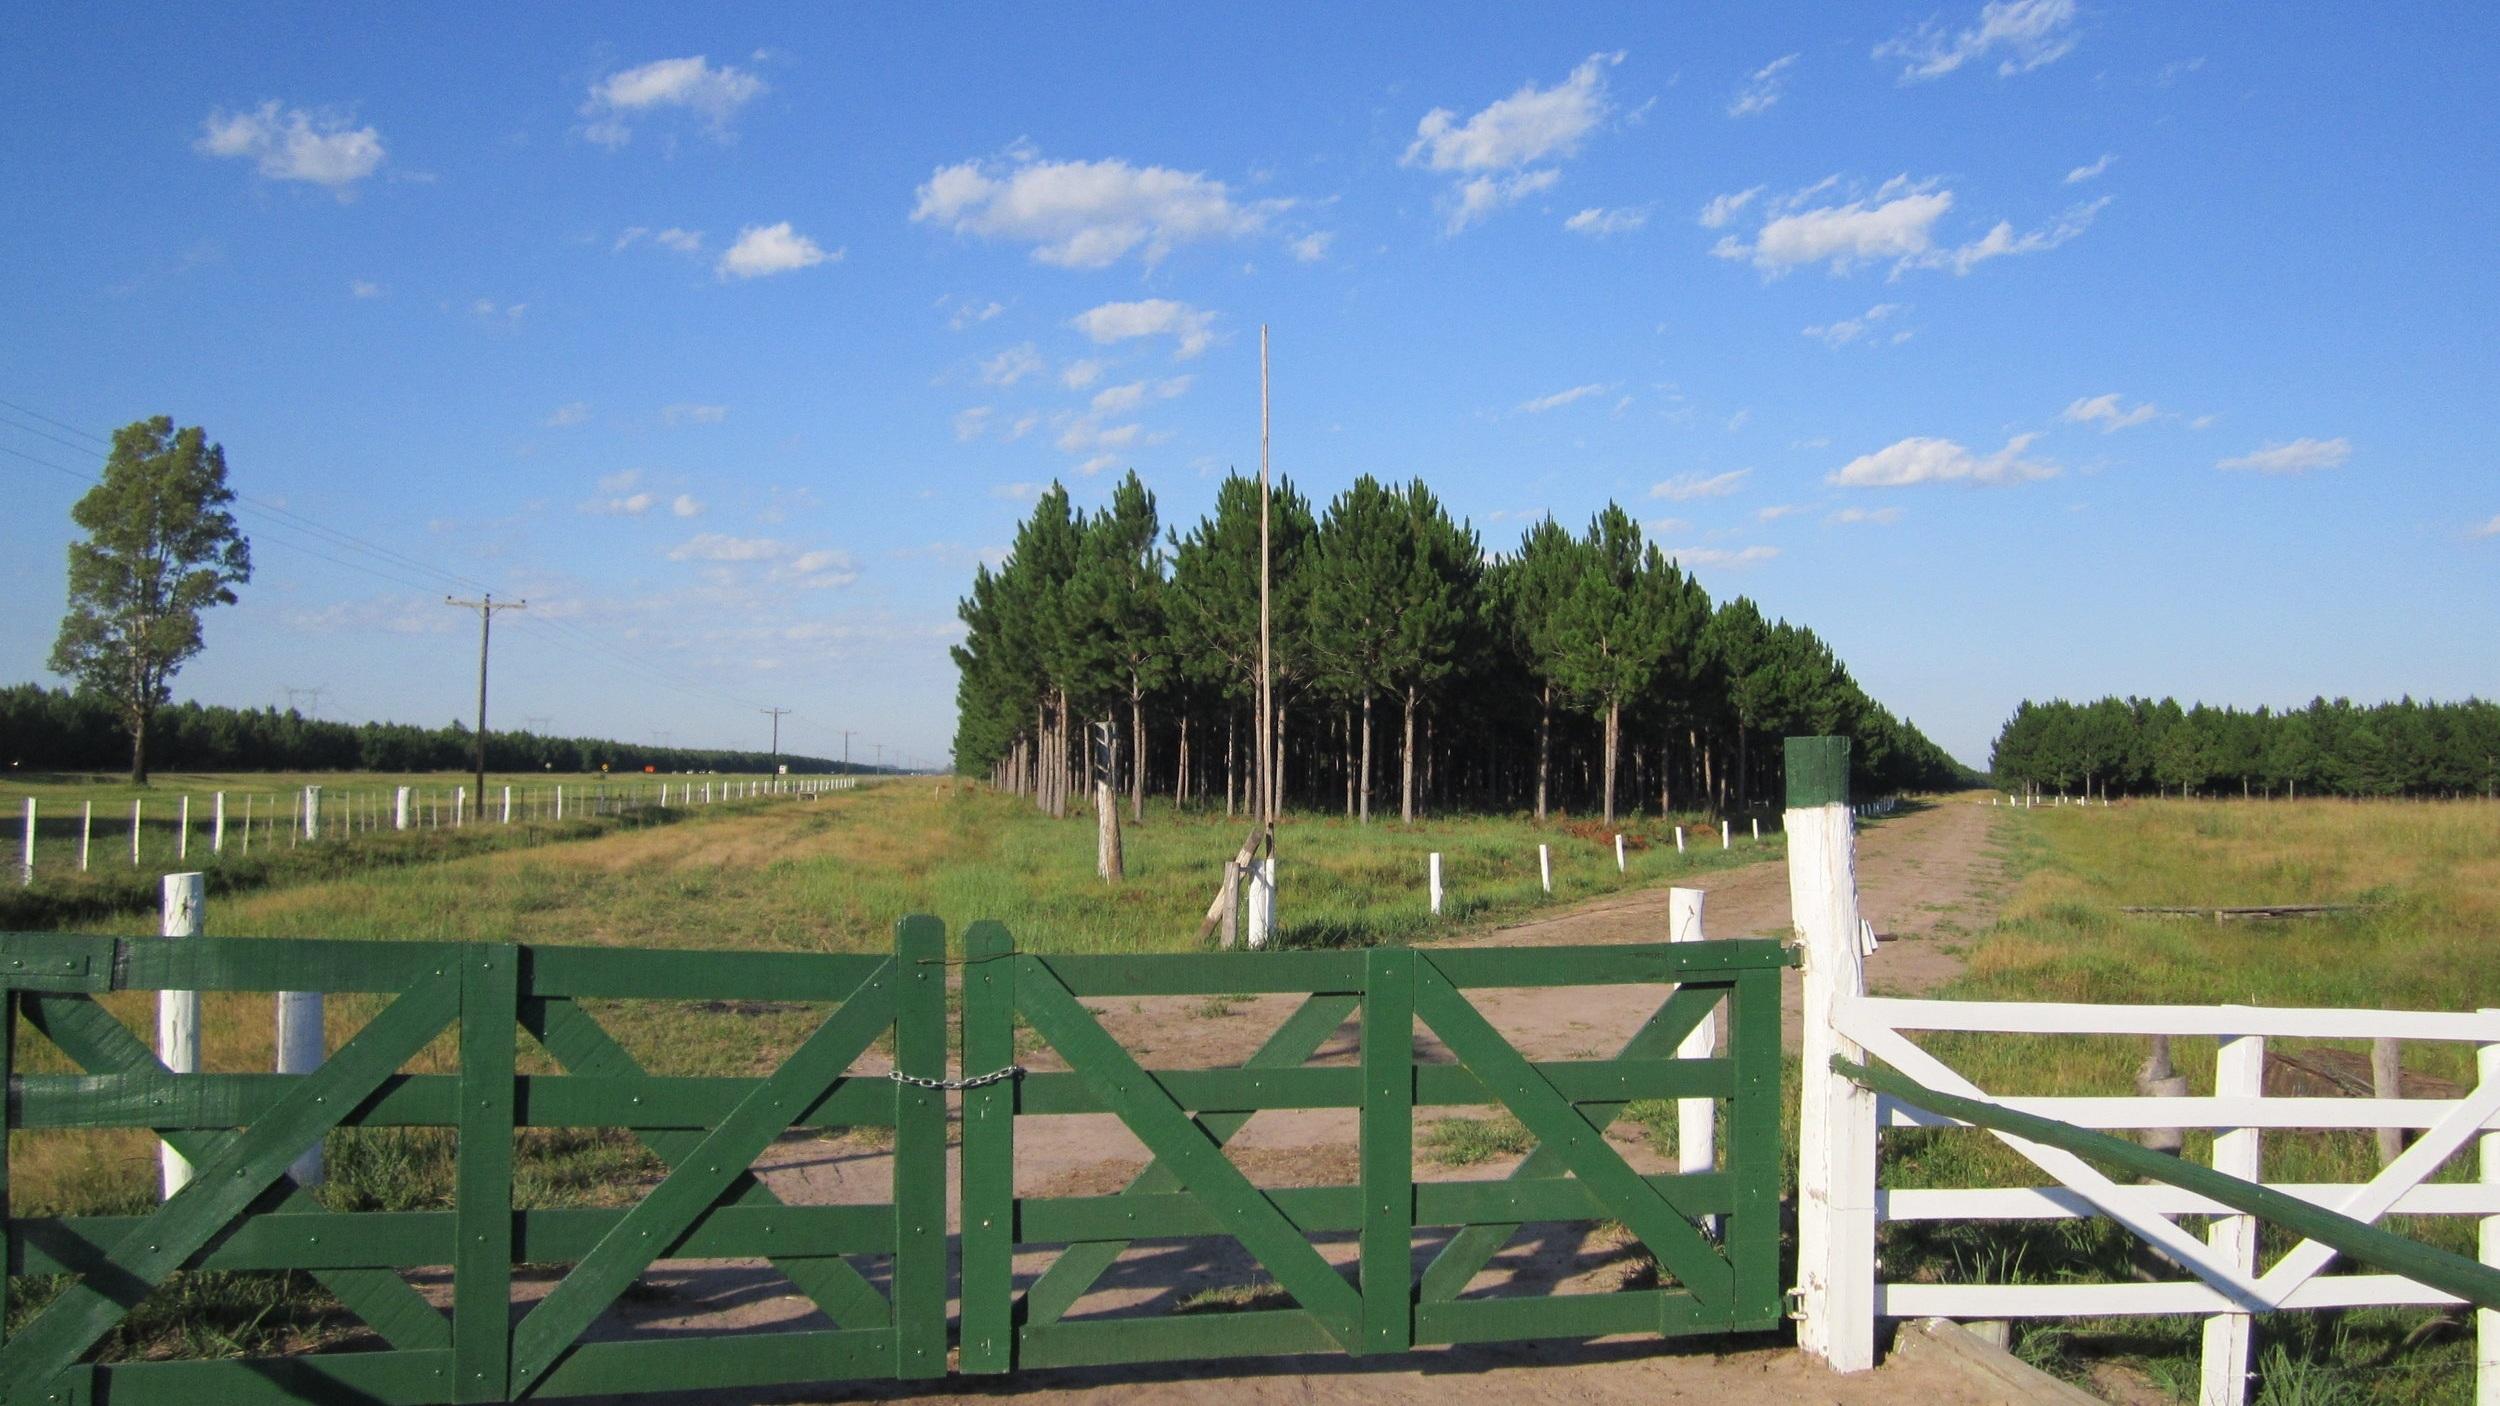 Forestry - LA NEGRA | Ituzaingó | Corrientes | 1600 hectaresLA NEGRITA | Ituzaingó | Corrientes | 613 hectaresEL CARRIZAL | Ituzaingó | Corrientes | 580 hectares